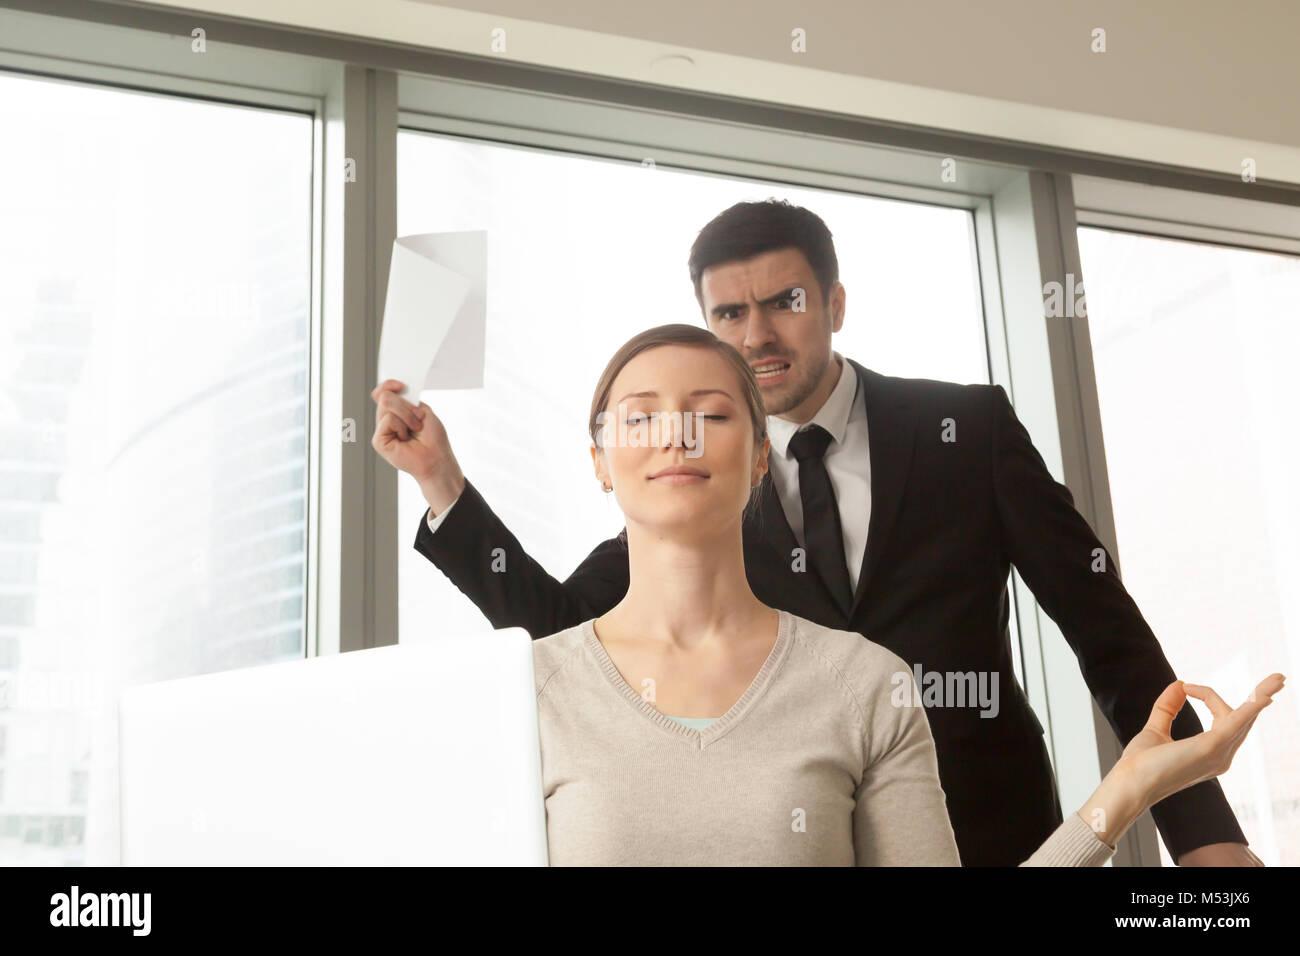 Female entrepreneur ignoring problems at work - Stock Image